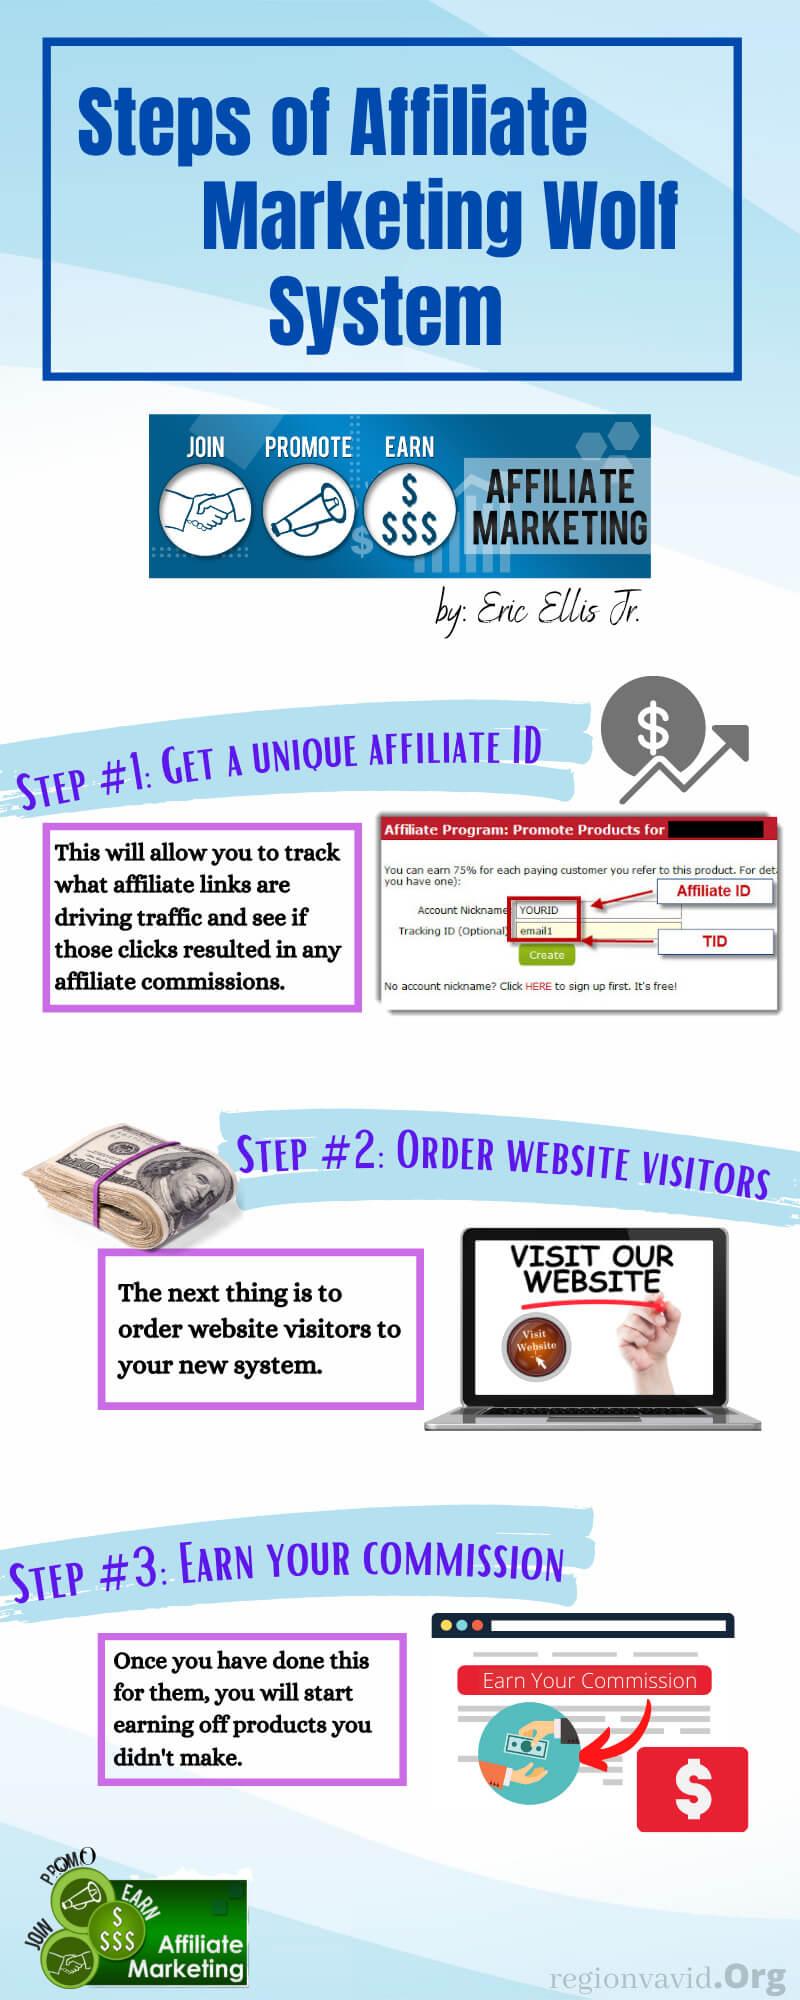 Affiliate Marketing Wolf Steps of the Program